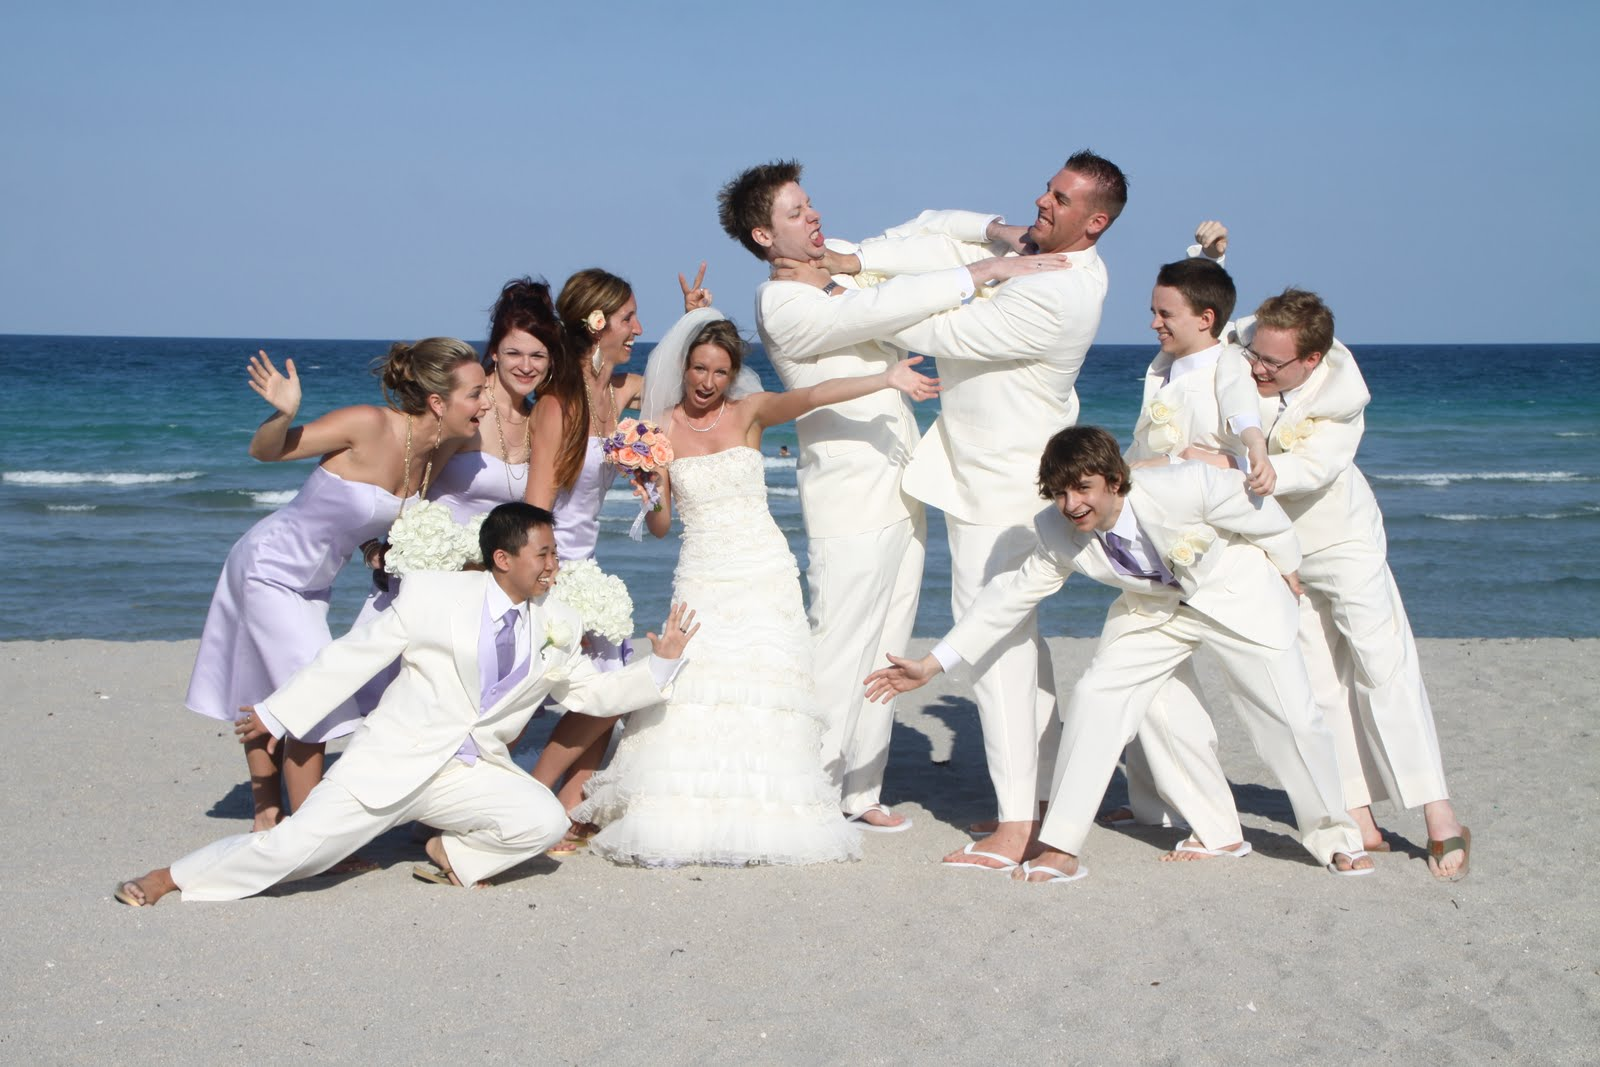 Affordable Beach Weddings! 305-793-4387: Kristin & Nick